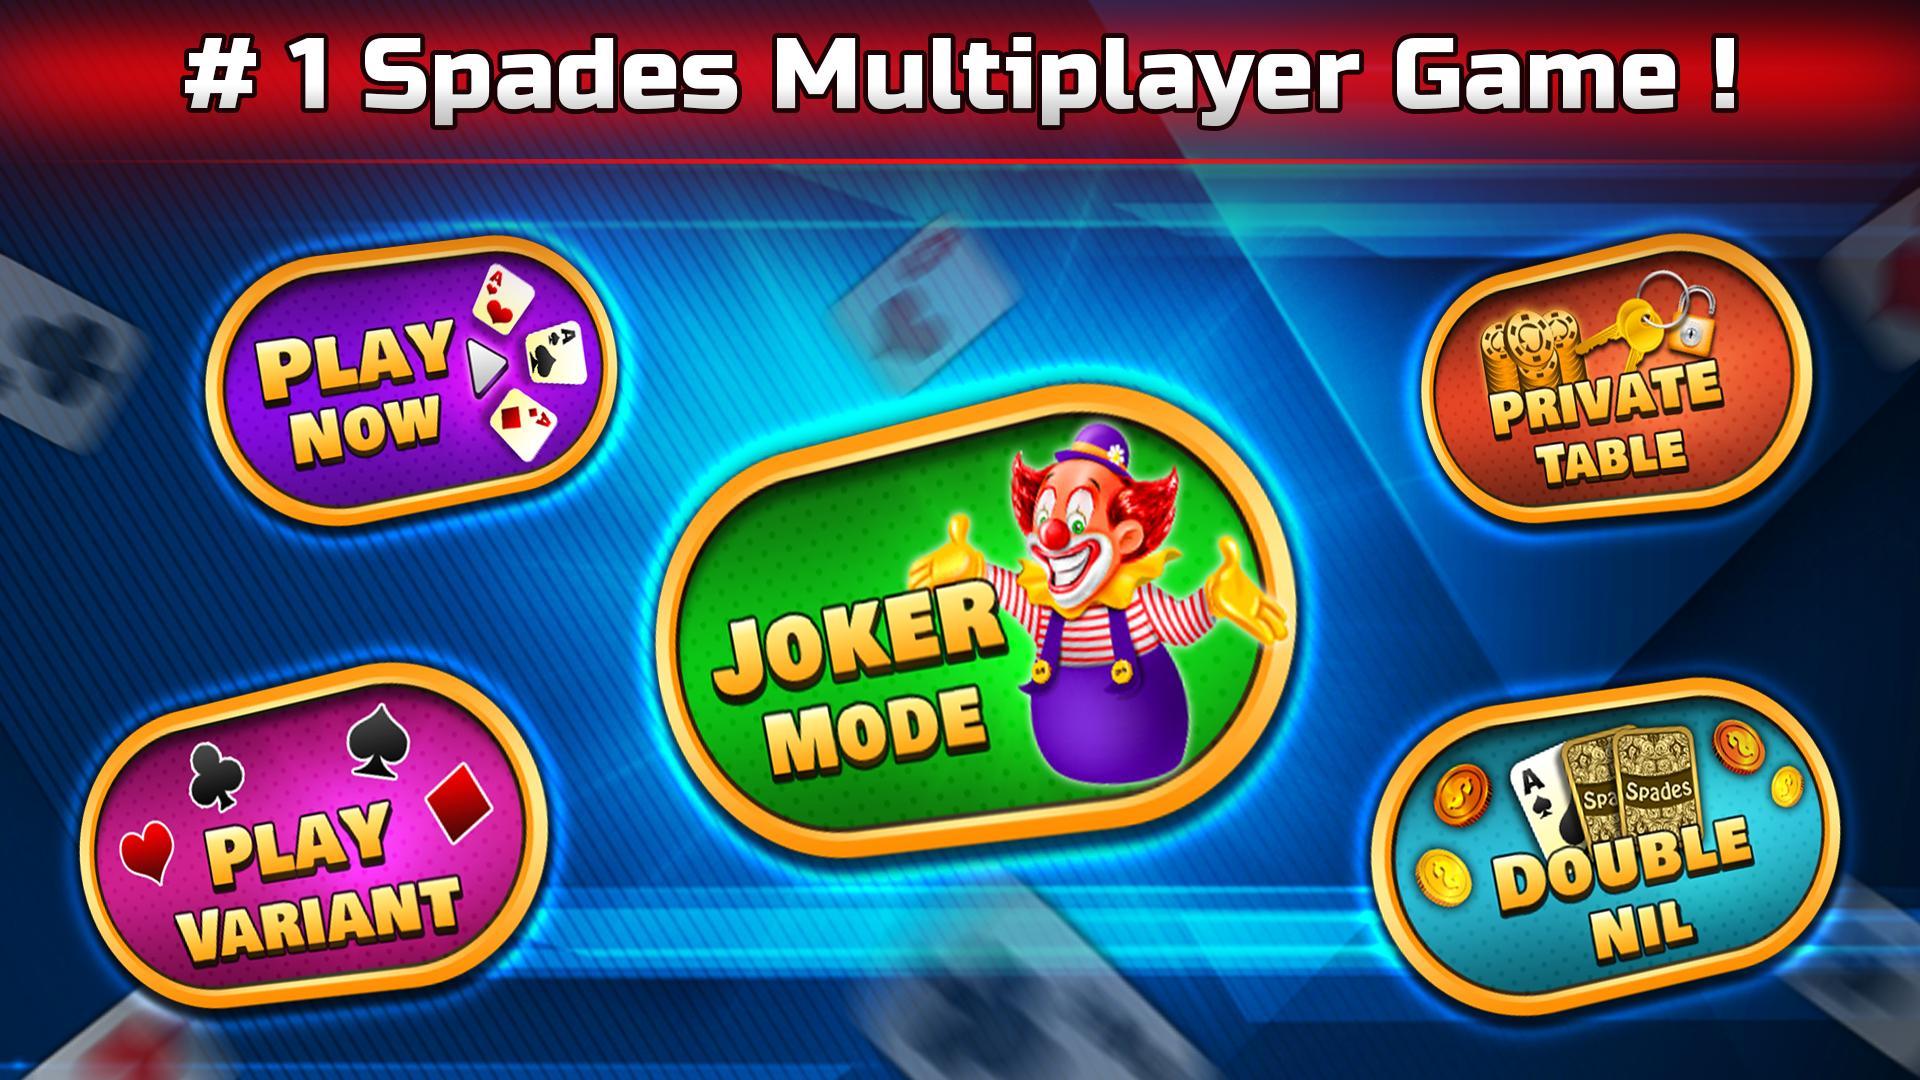 Spades Free - Multiplayer Online Card Game 1.6.3 Screenshot 1